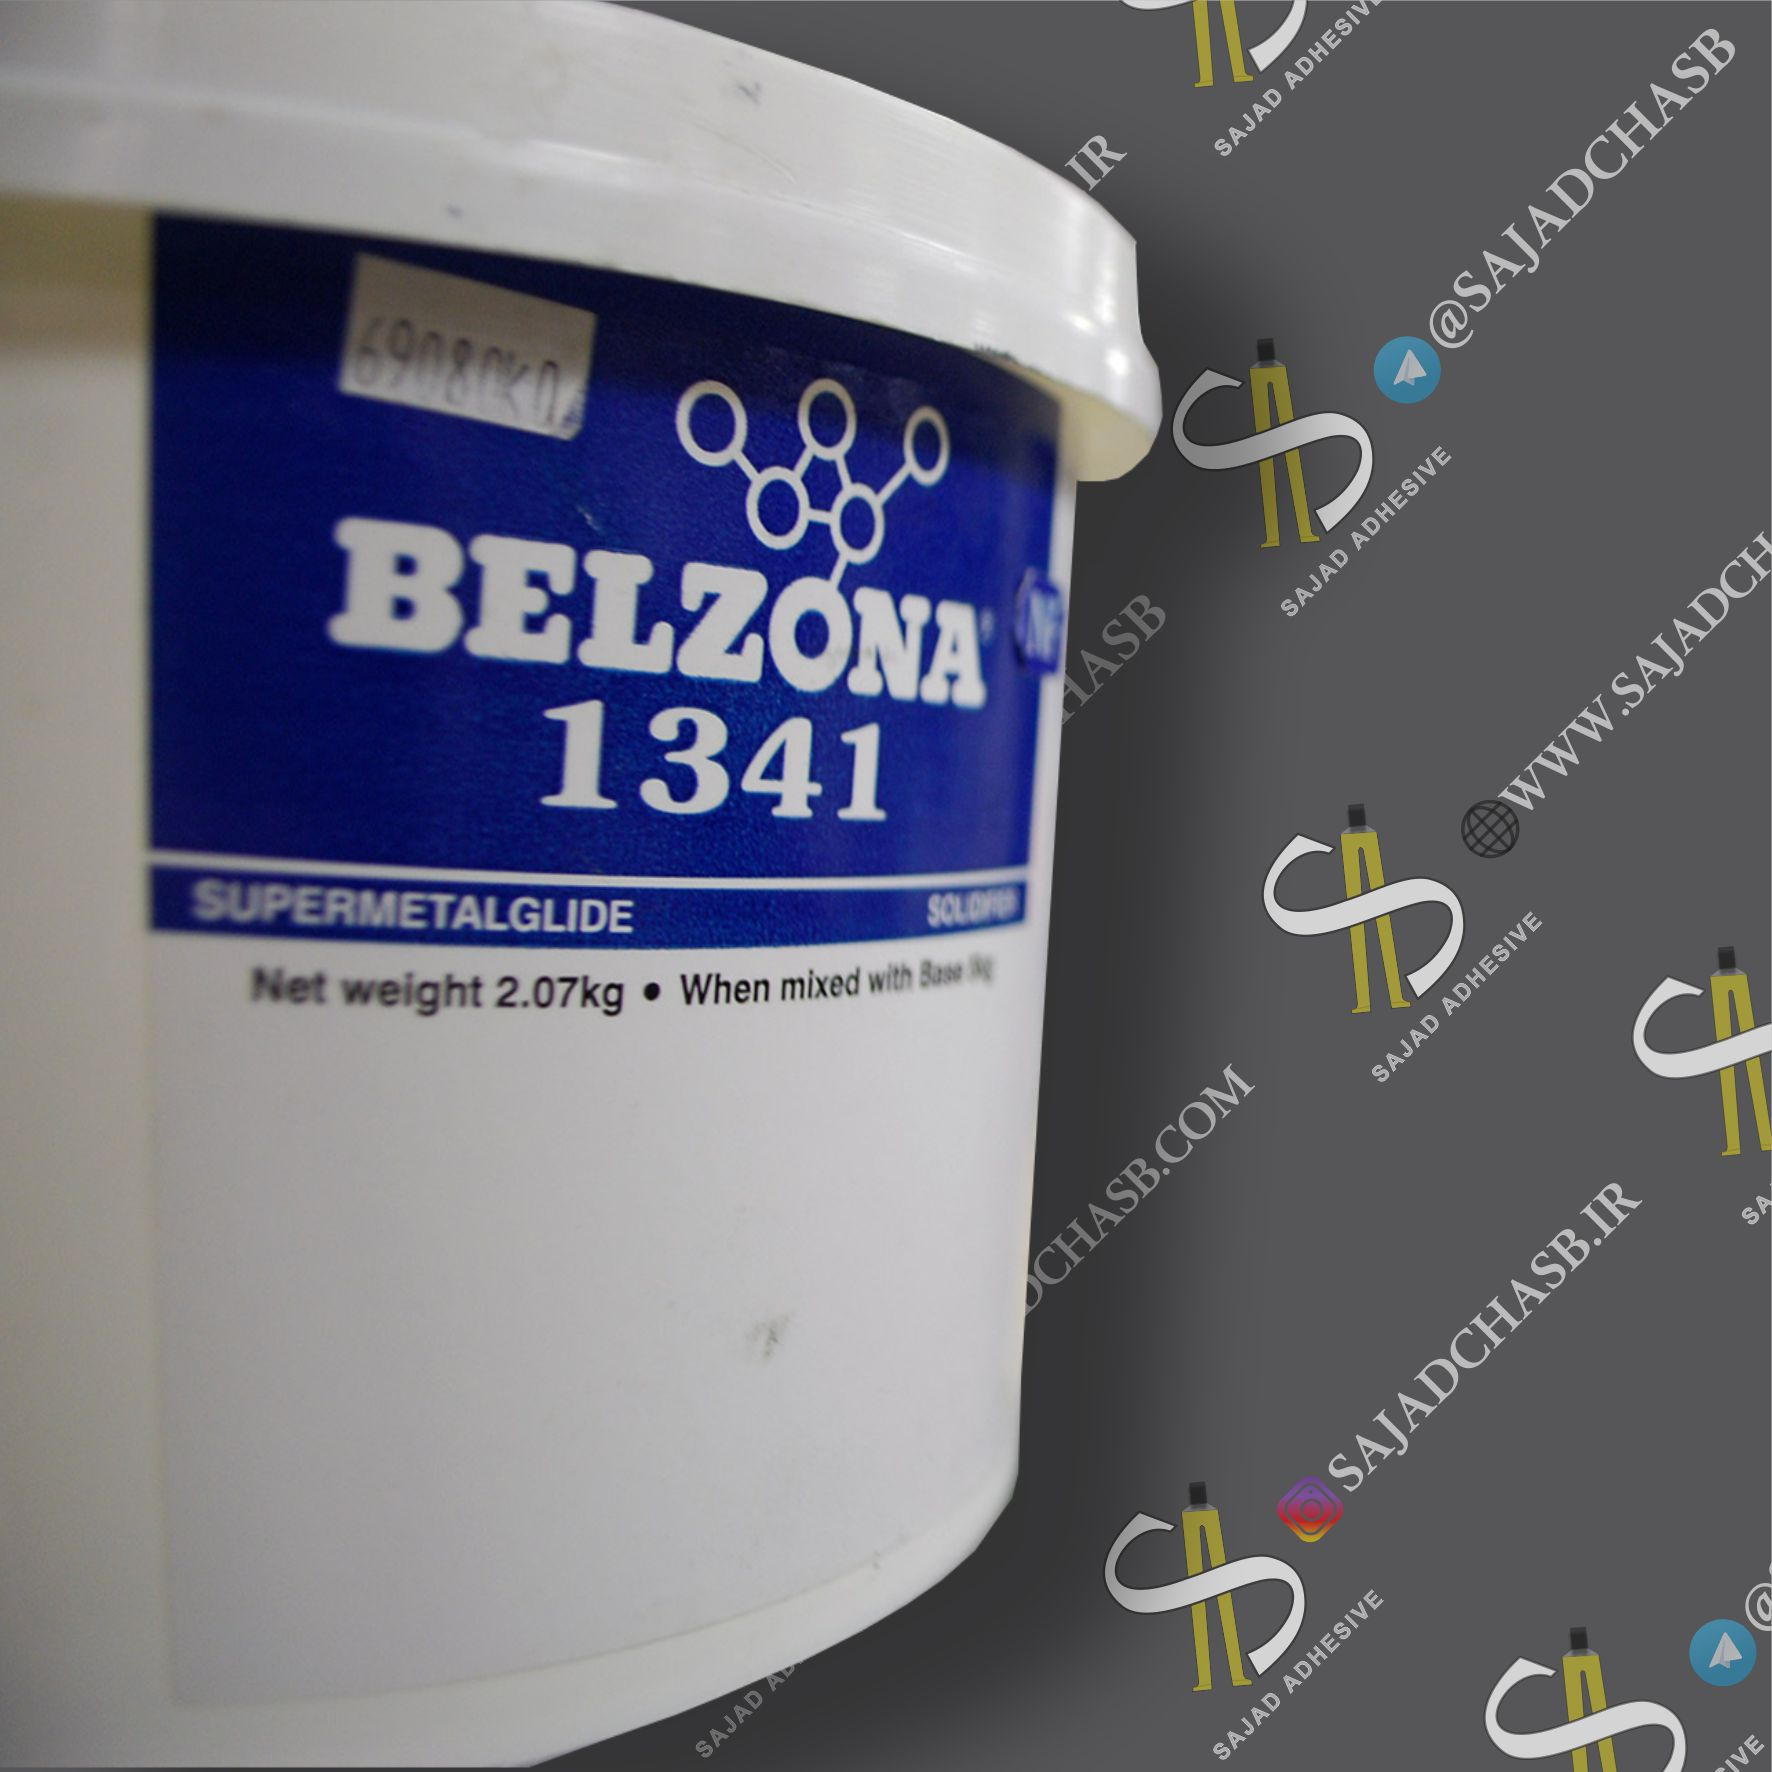 چسب اپوکسی بلزونا BELZONA 1341